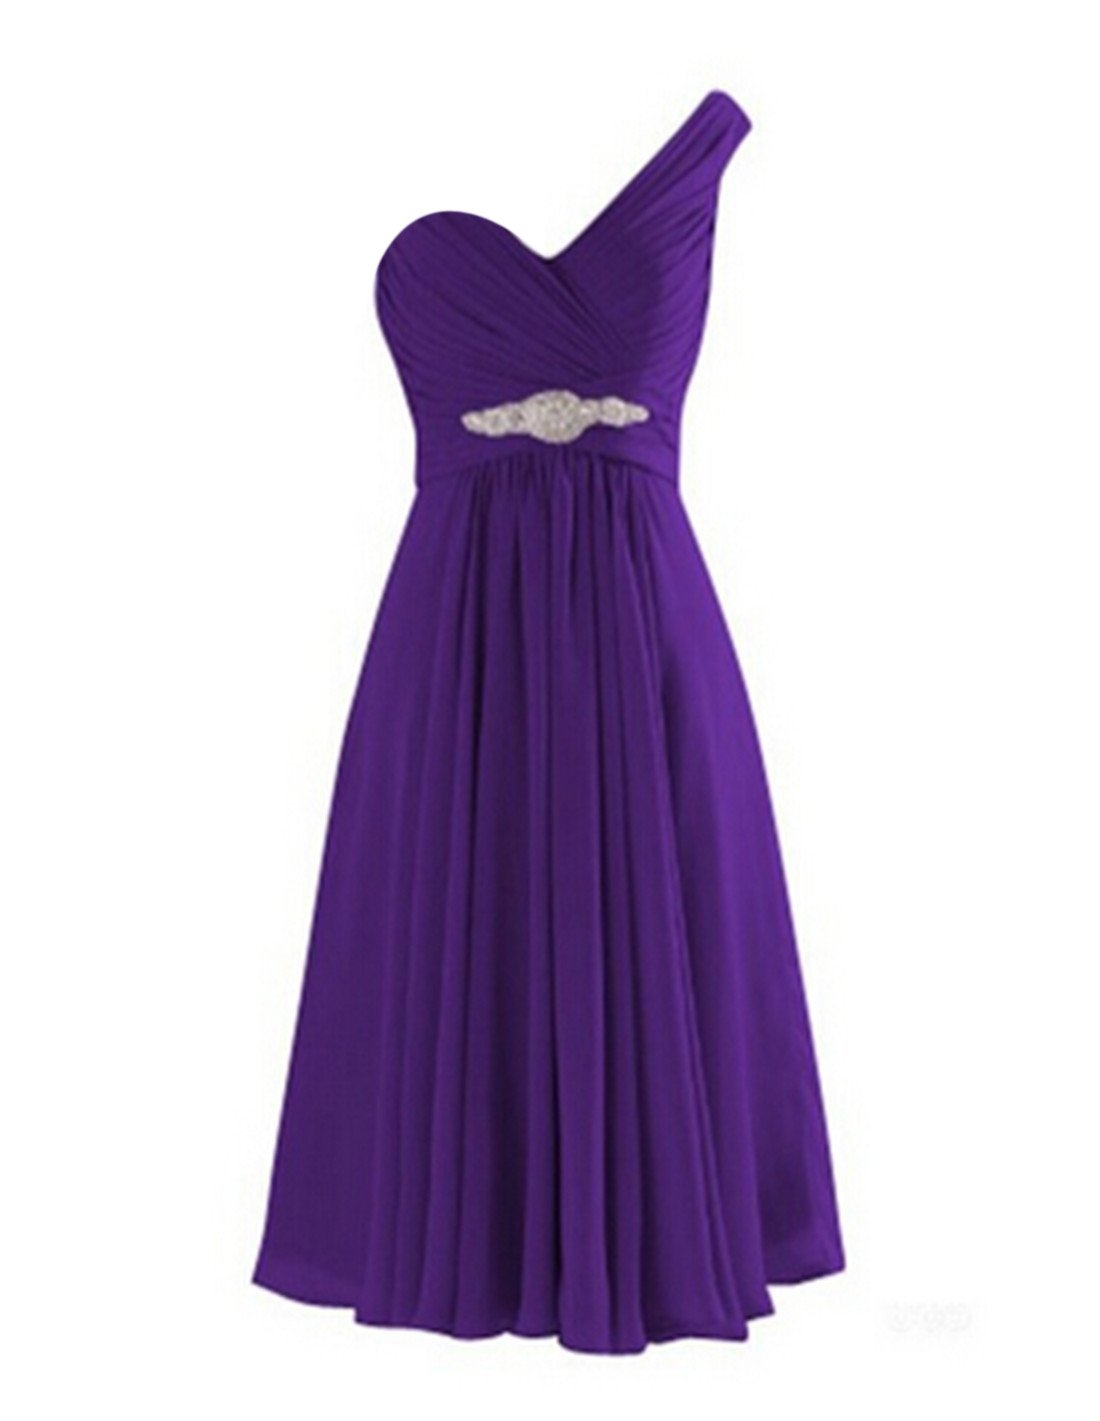 VaniaDress One Shoulder Tea Length Evening Bridesmaid Prom Dresses V273LF Purple US6